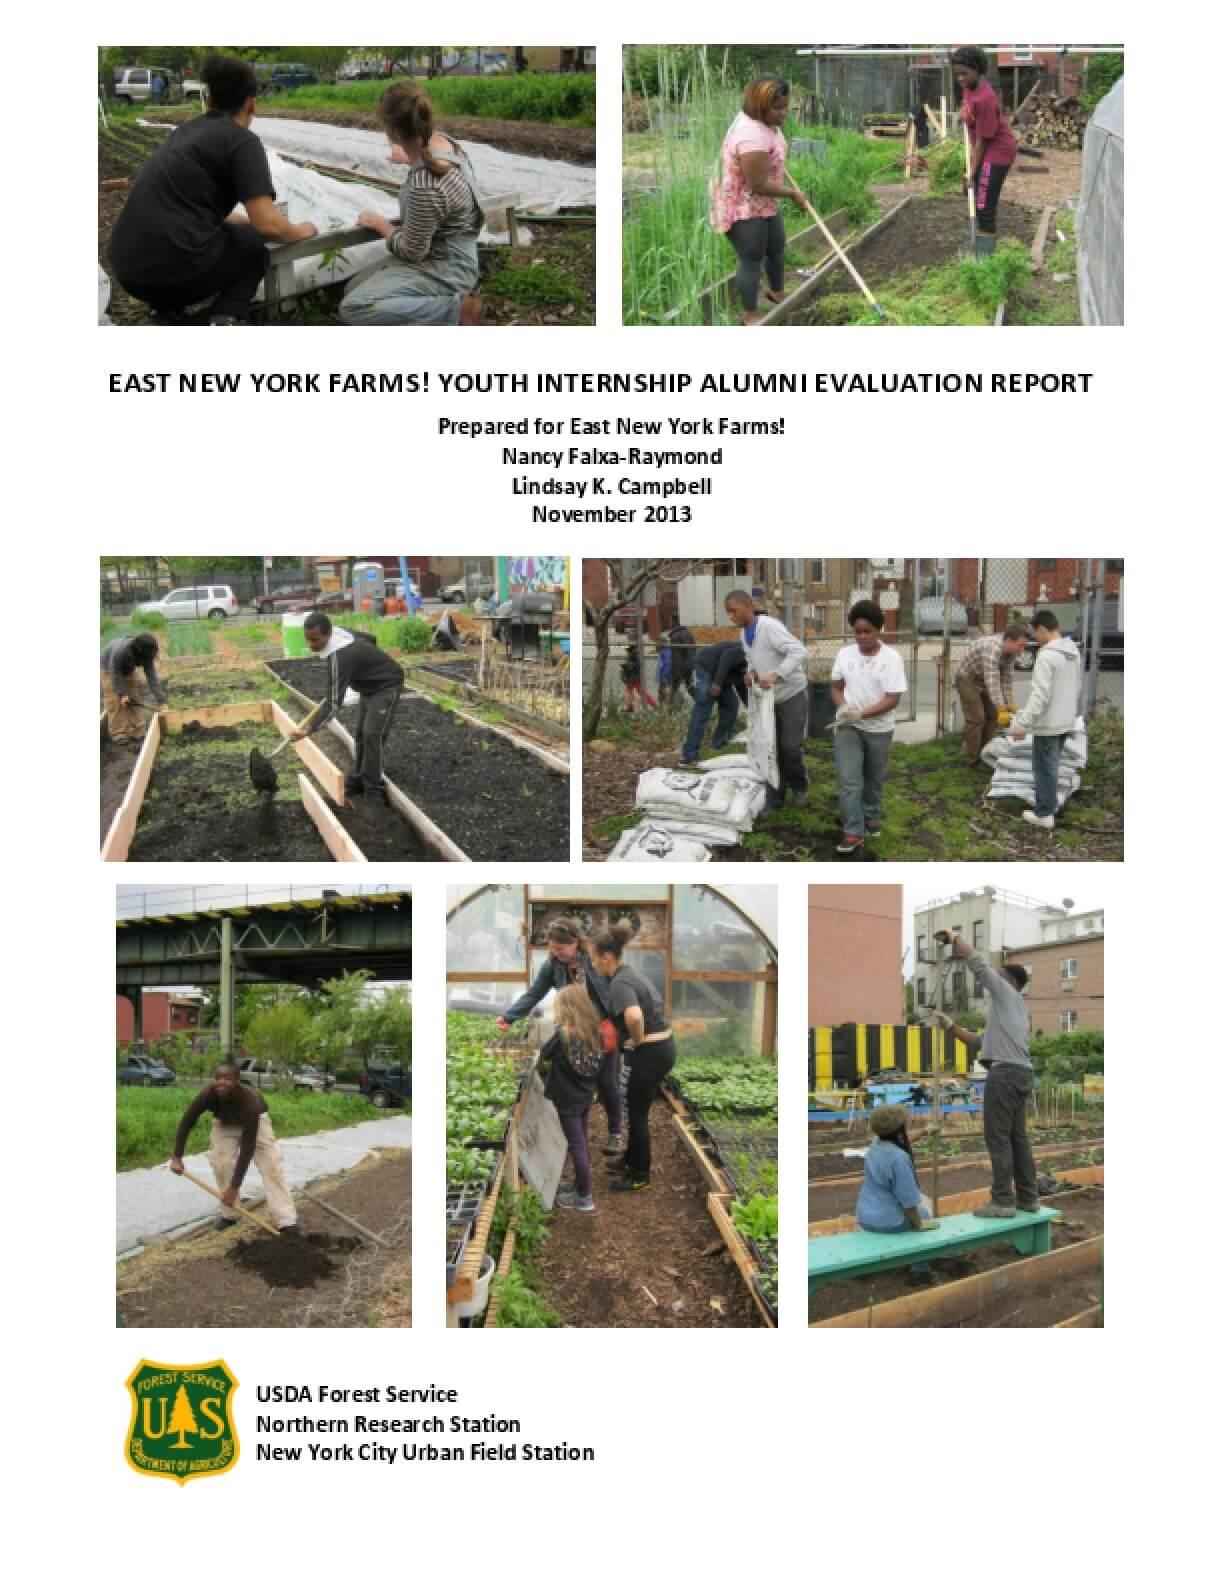 East New York Farms! Youth Internship Alumni Evaluation Report